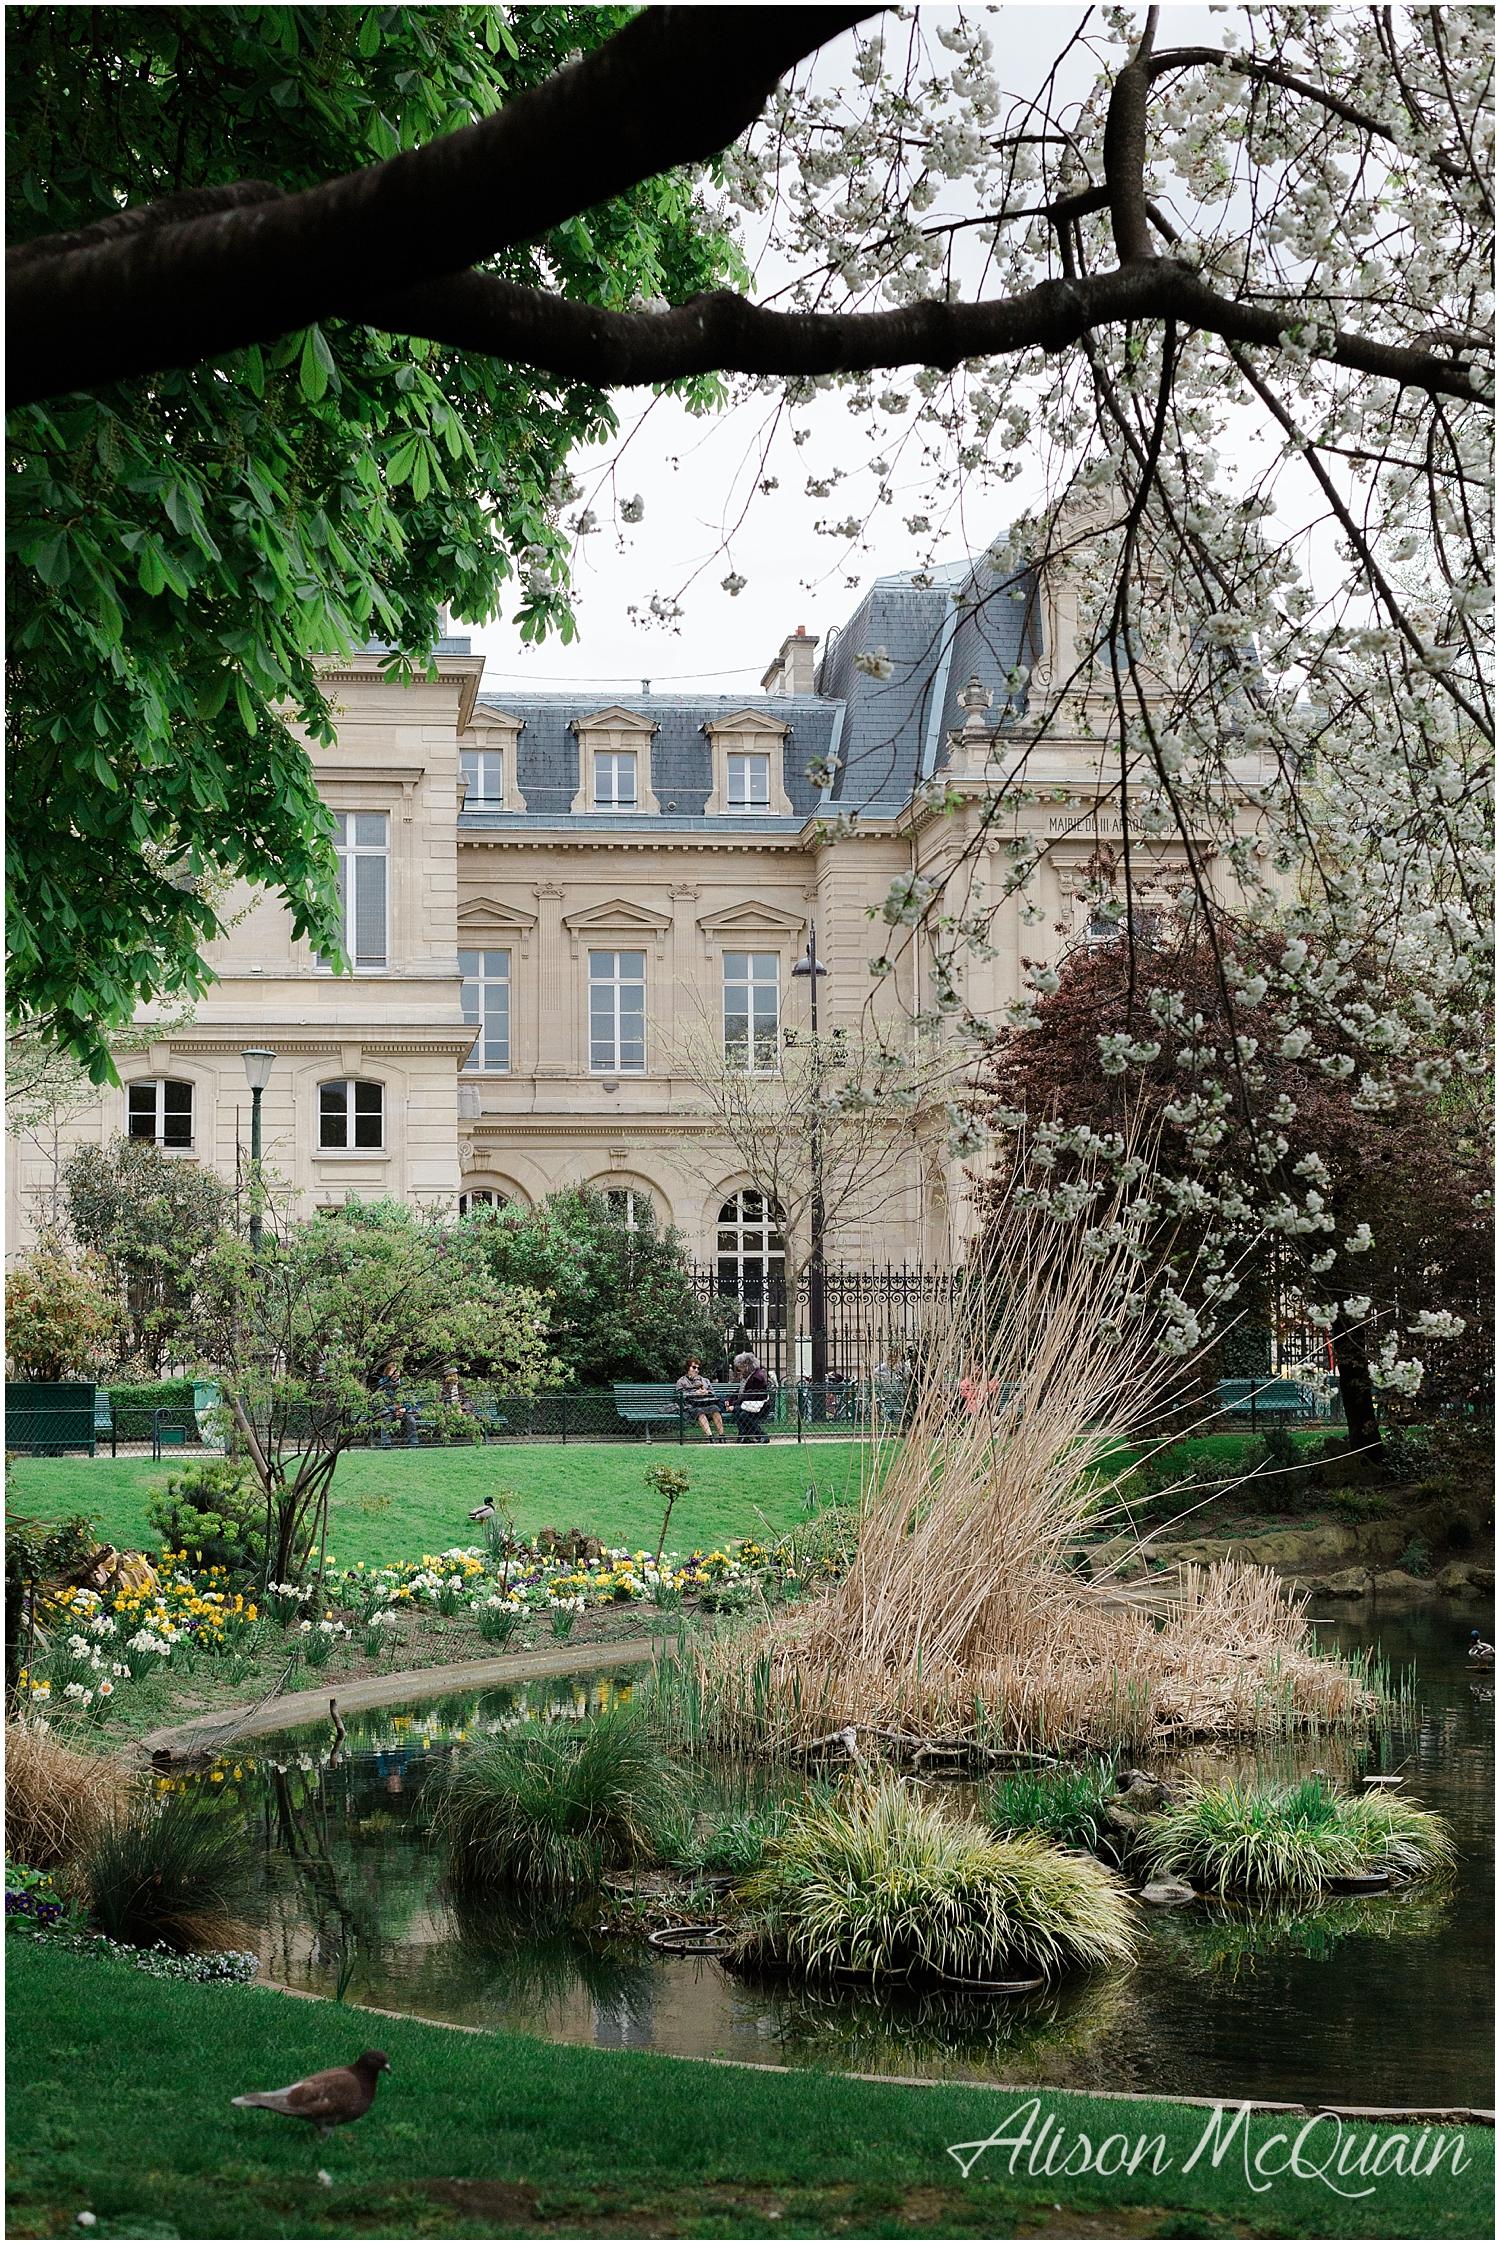 France_Paris_Marseille_Cassis_alisonmcquainphtography2018-04-27_0018.jpg